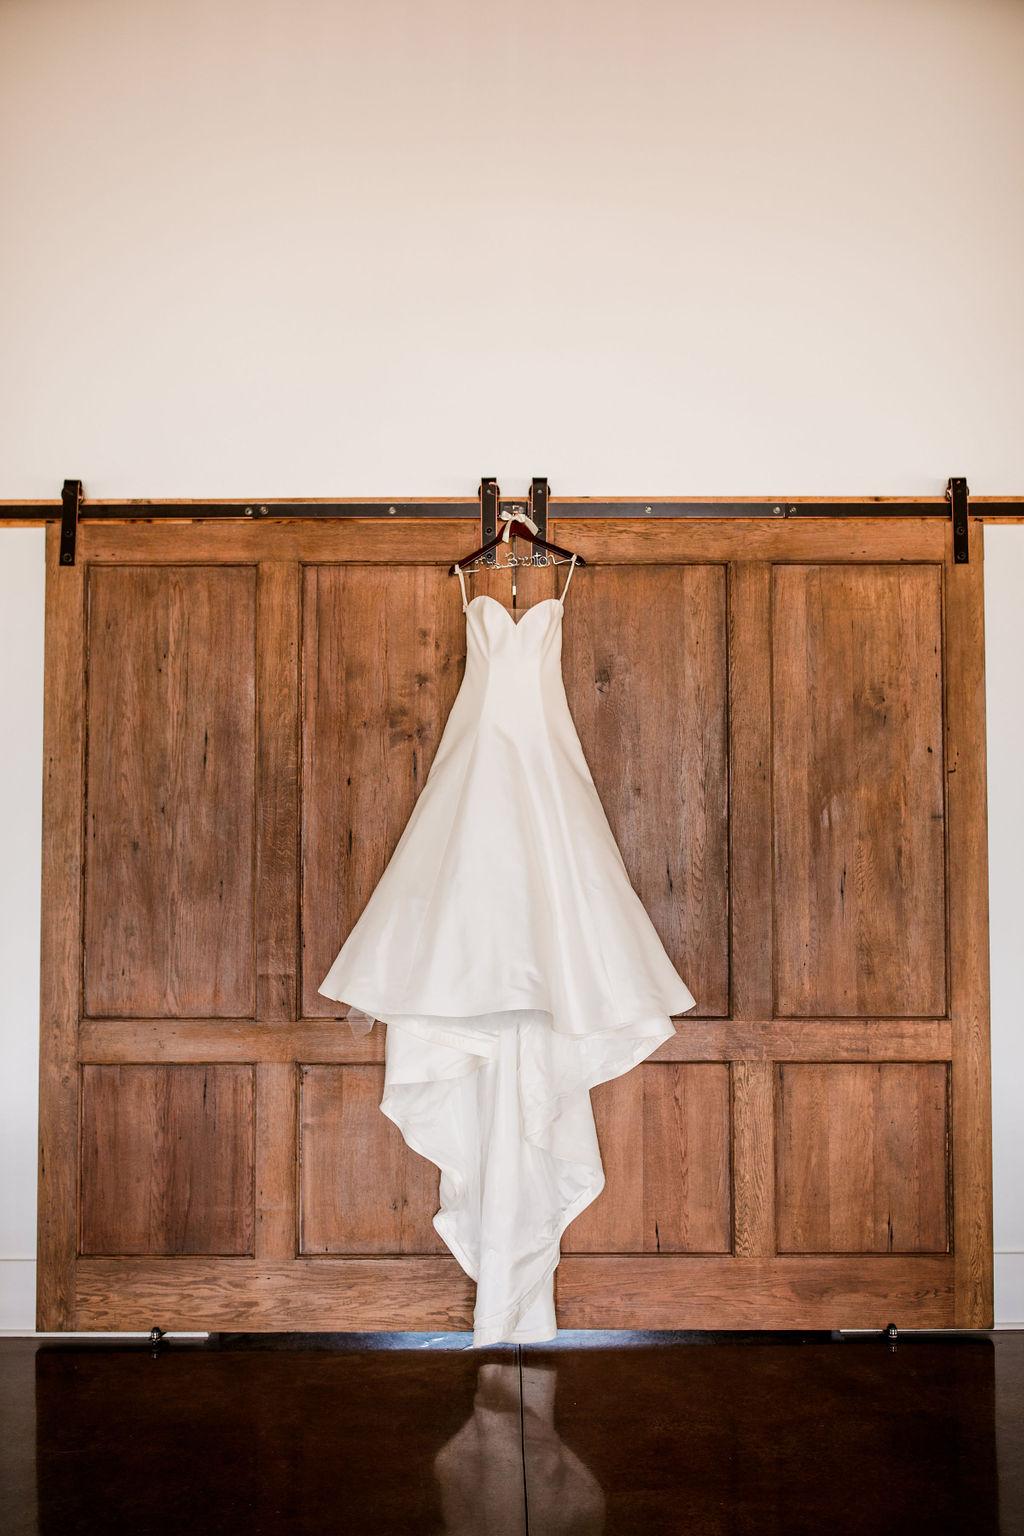 Ballgown Wedding Dress: Beautiful Graystone Quarry Wedding captured by John Myers Photography & Videography